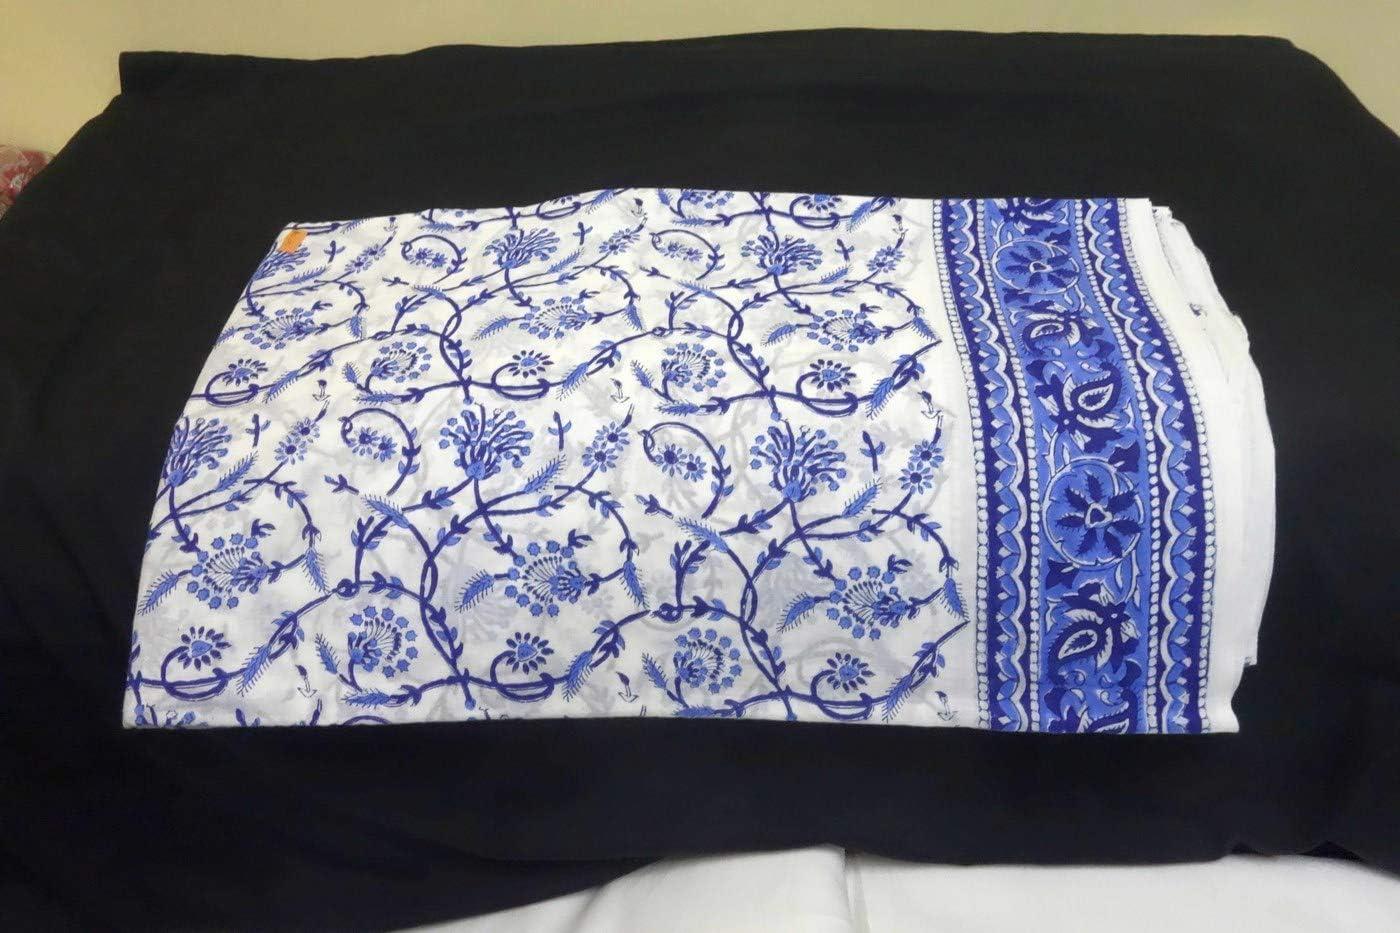 Indian Cotton 5 yard Hand Block Print Natural Running Indigo Flower Craft Fabric